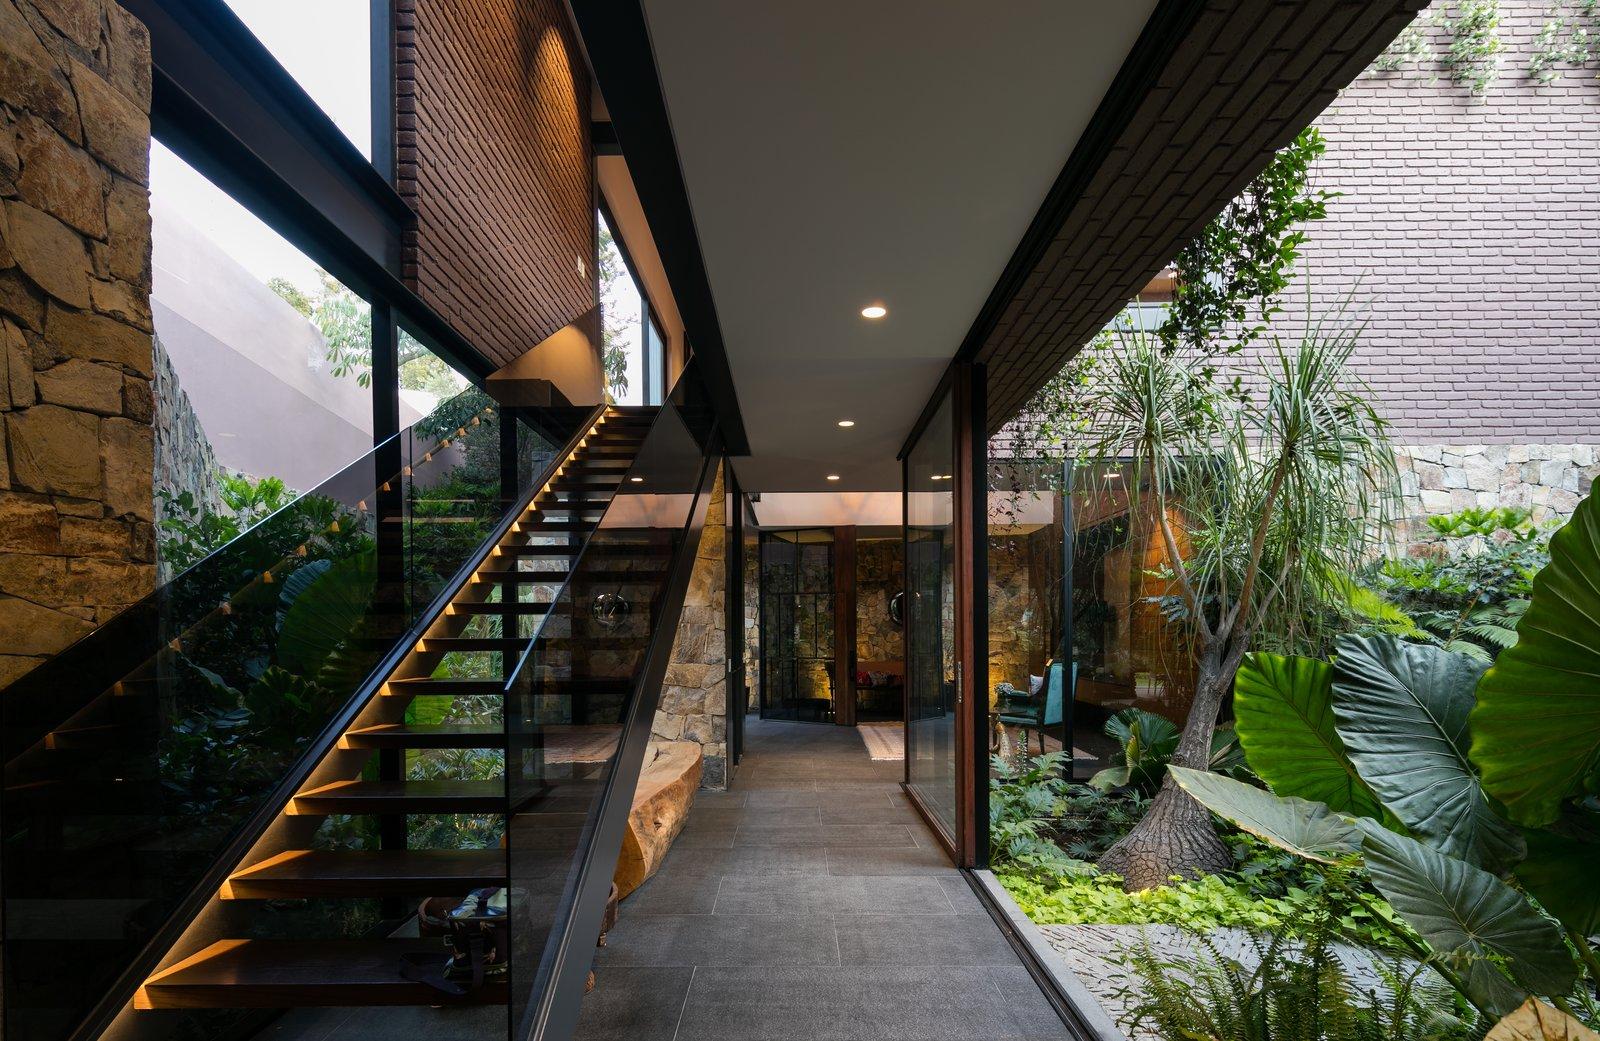 Tagged: Staircase, Metal Tread, Wood Tread, Glass Railing, and Metal Railing.  Casa OM1 by Santiago Rivero